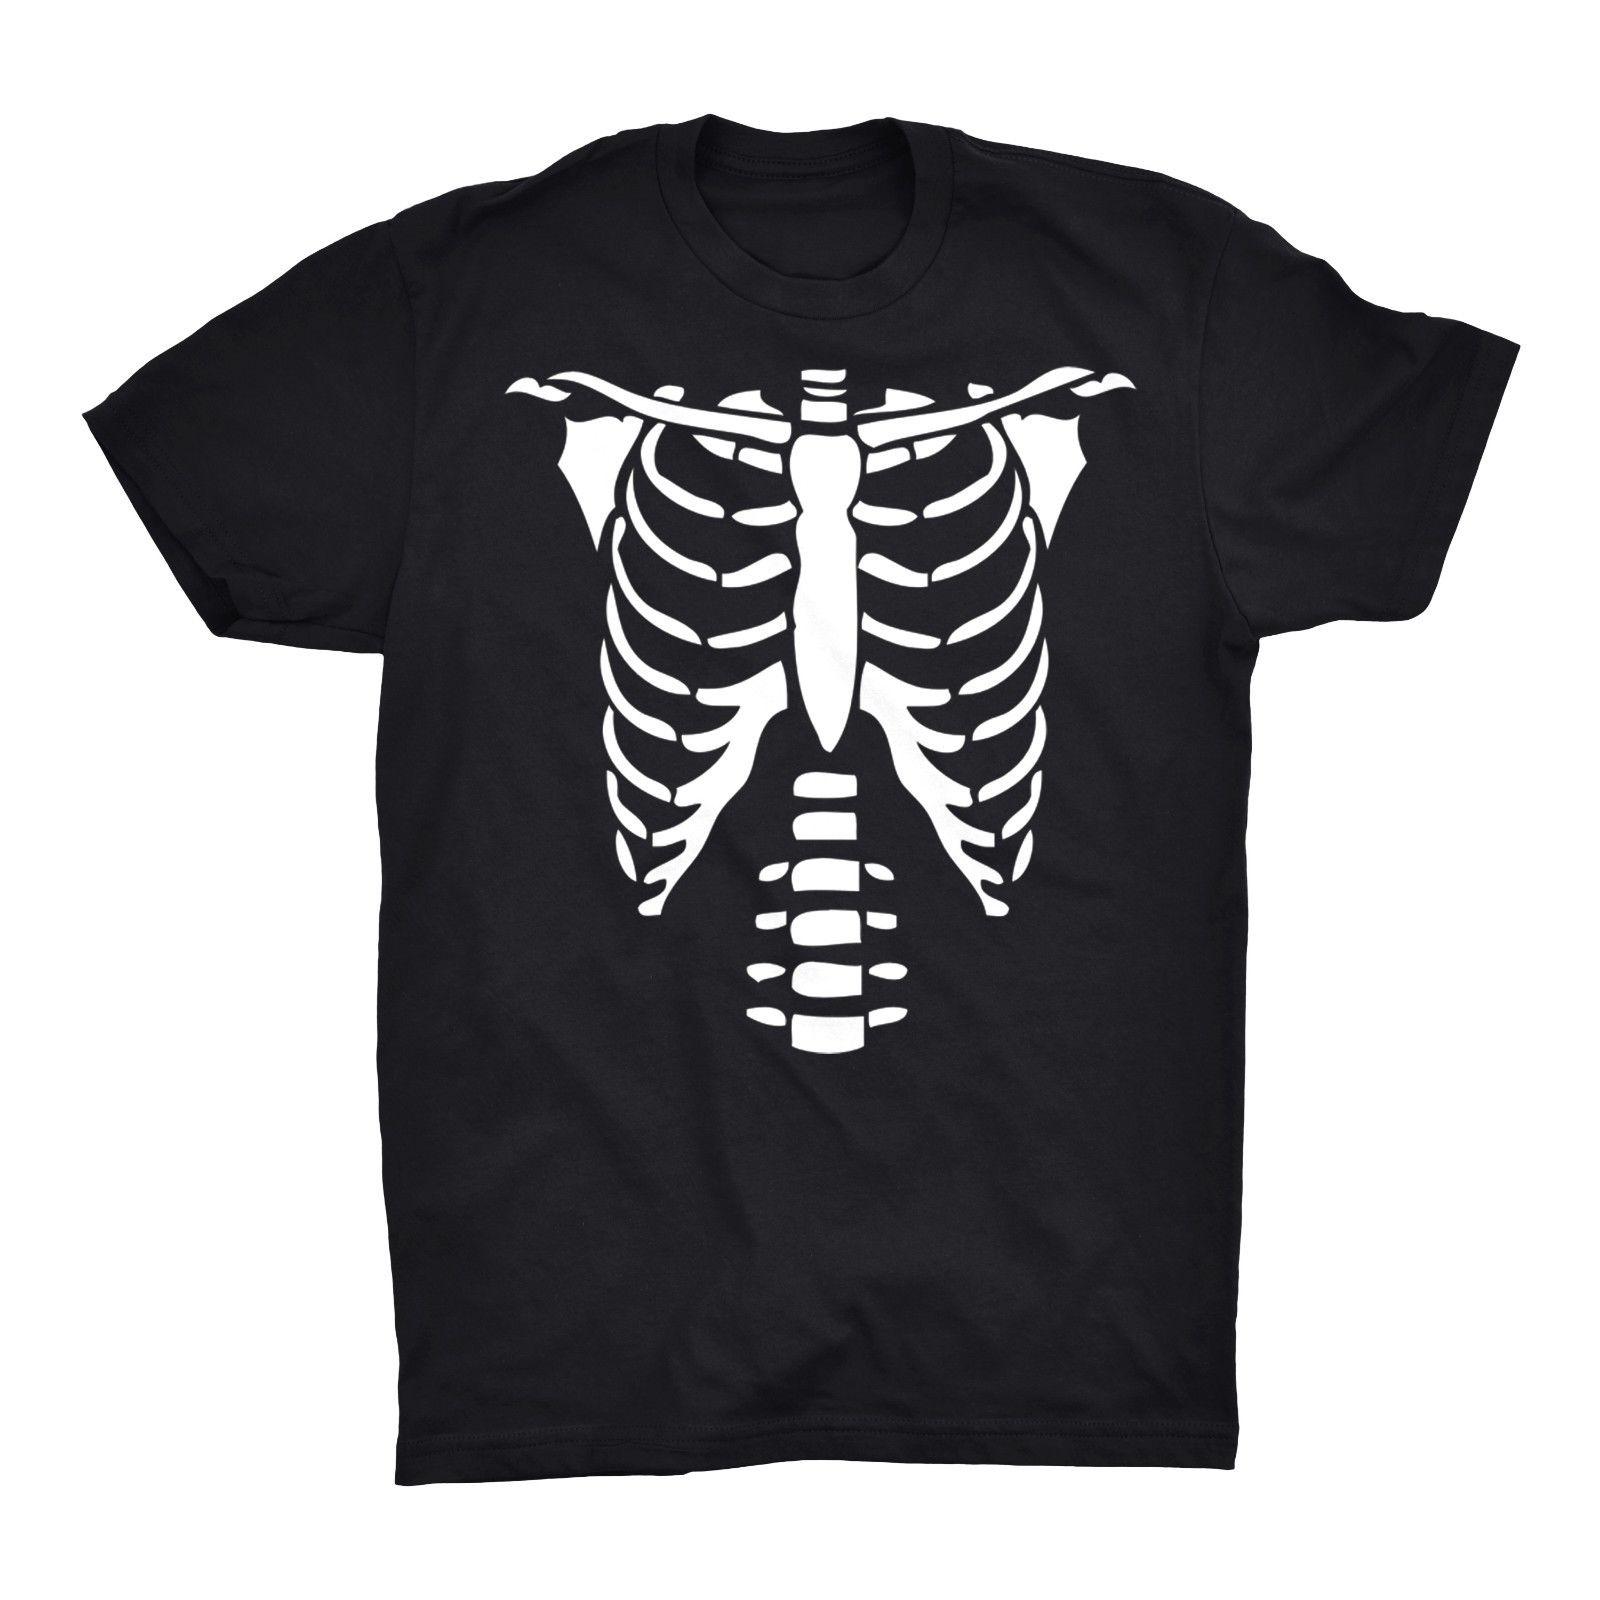 Camiseta de manga corta de algodón esqueleto pecho camiseta ribbage calavera costillas Halloween divertido aterrador espeluznante verano